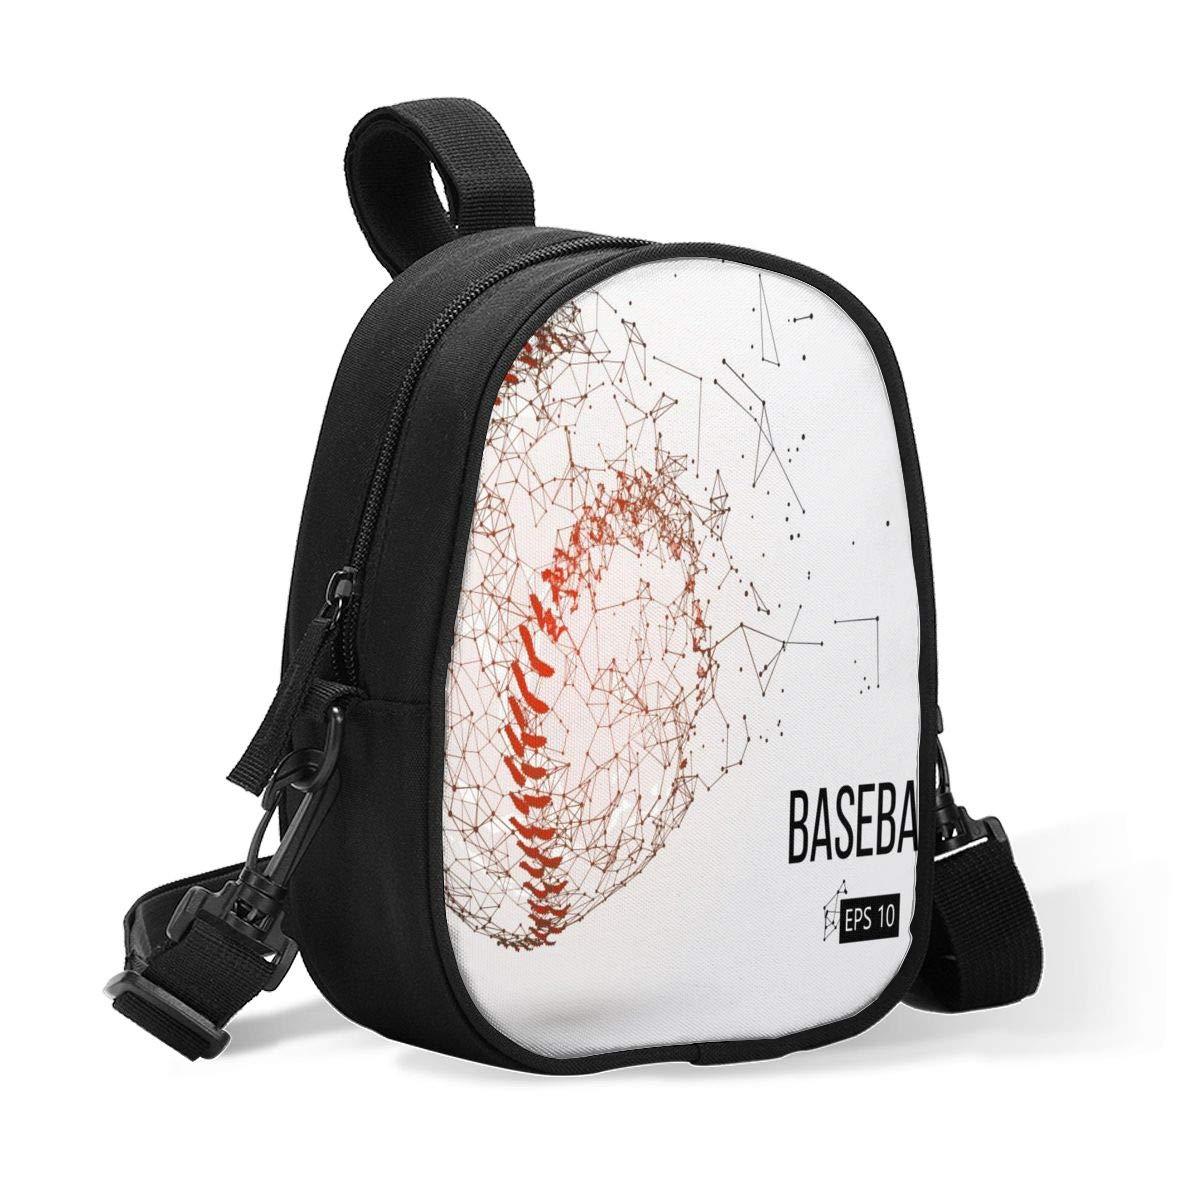 Insulated Baby Bottle Bag Outline of Baseball Multi-Function Breastmilk Cooler Bag & Lunch Bag, Fit As Wine Carrier Or for Milk Bottles, for Nursing Mom Back to Work for 2 Large Bottles